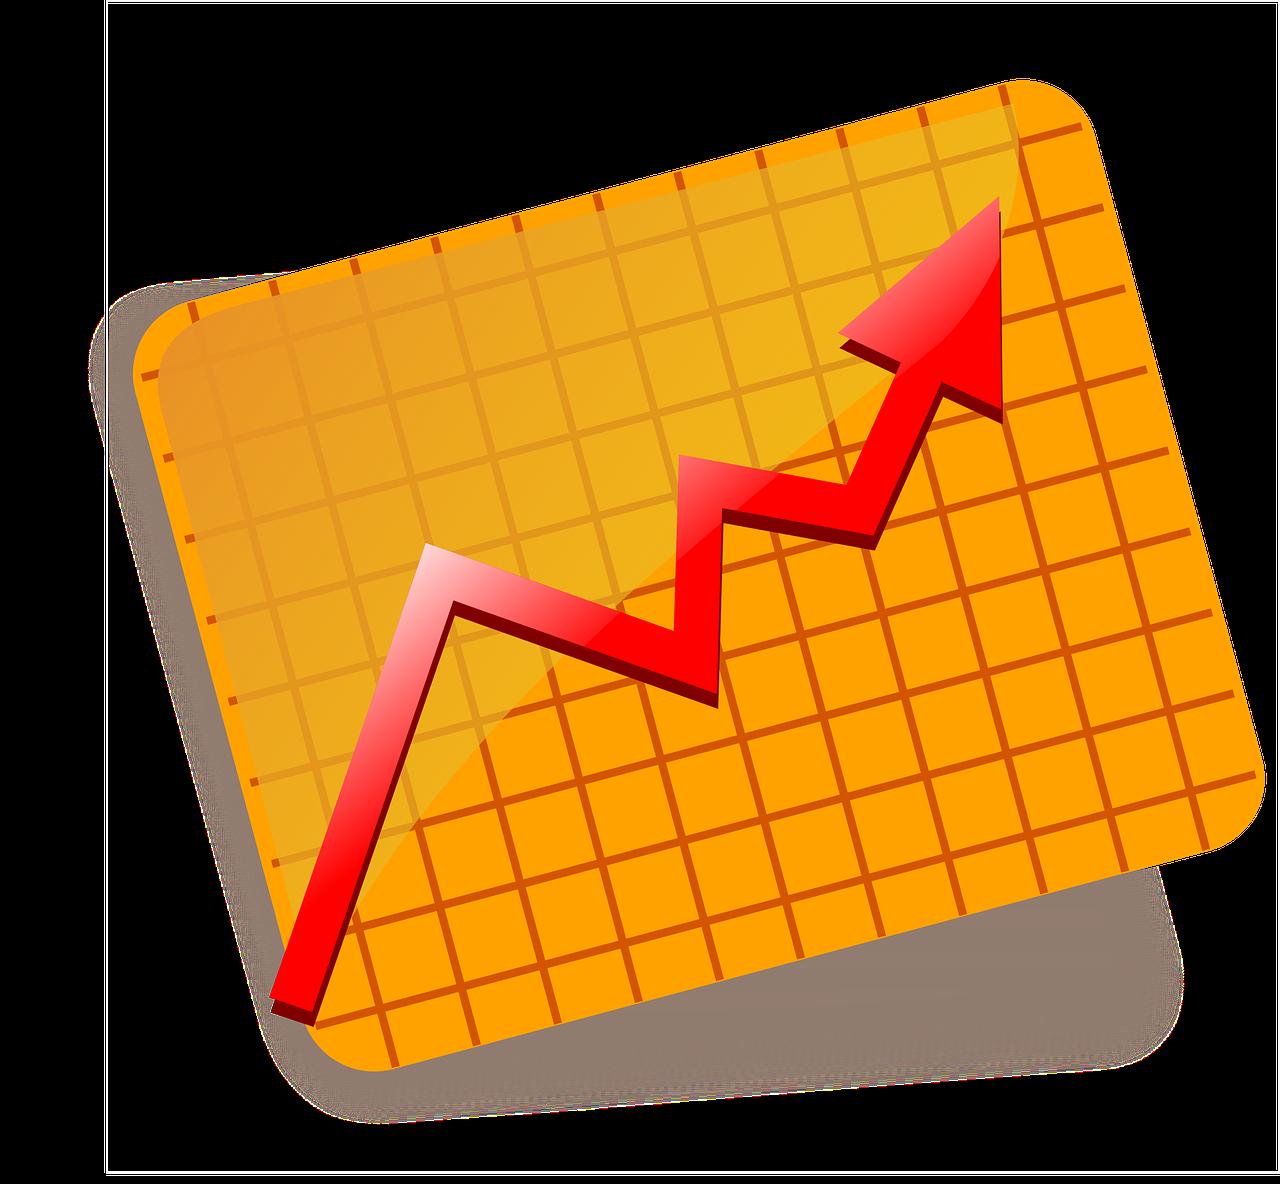 chart, graph, icon-1296049.jpg